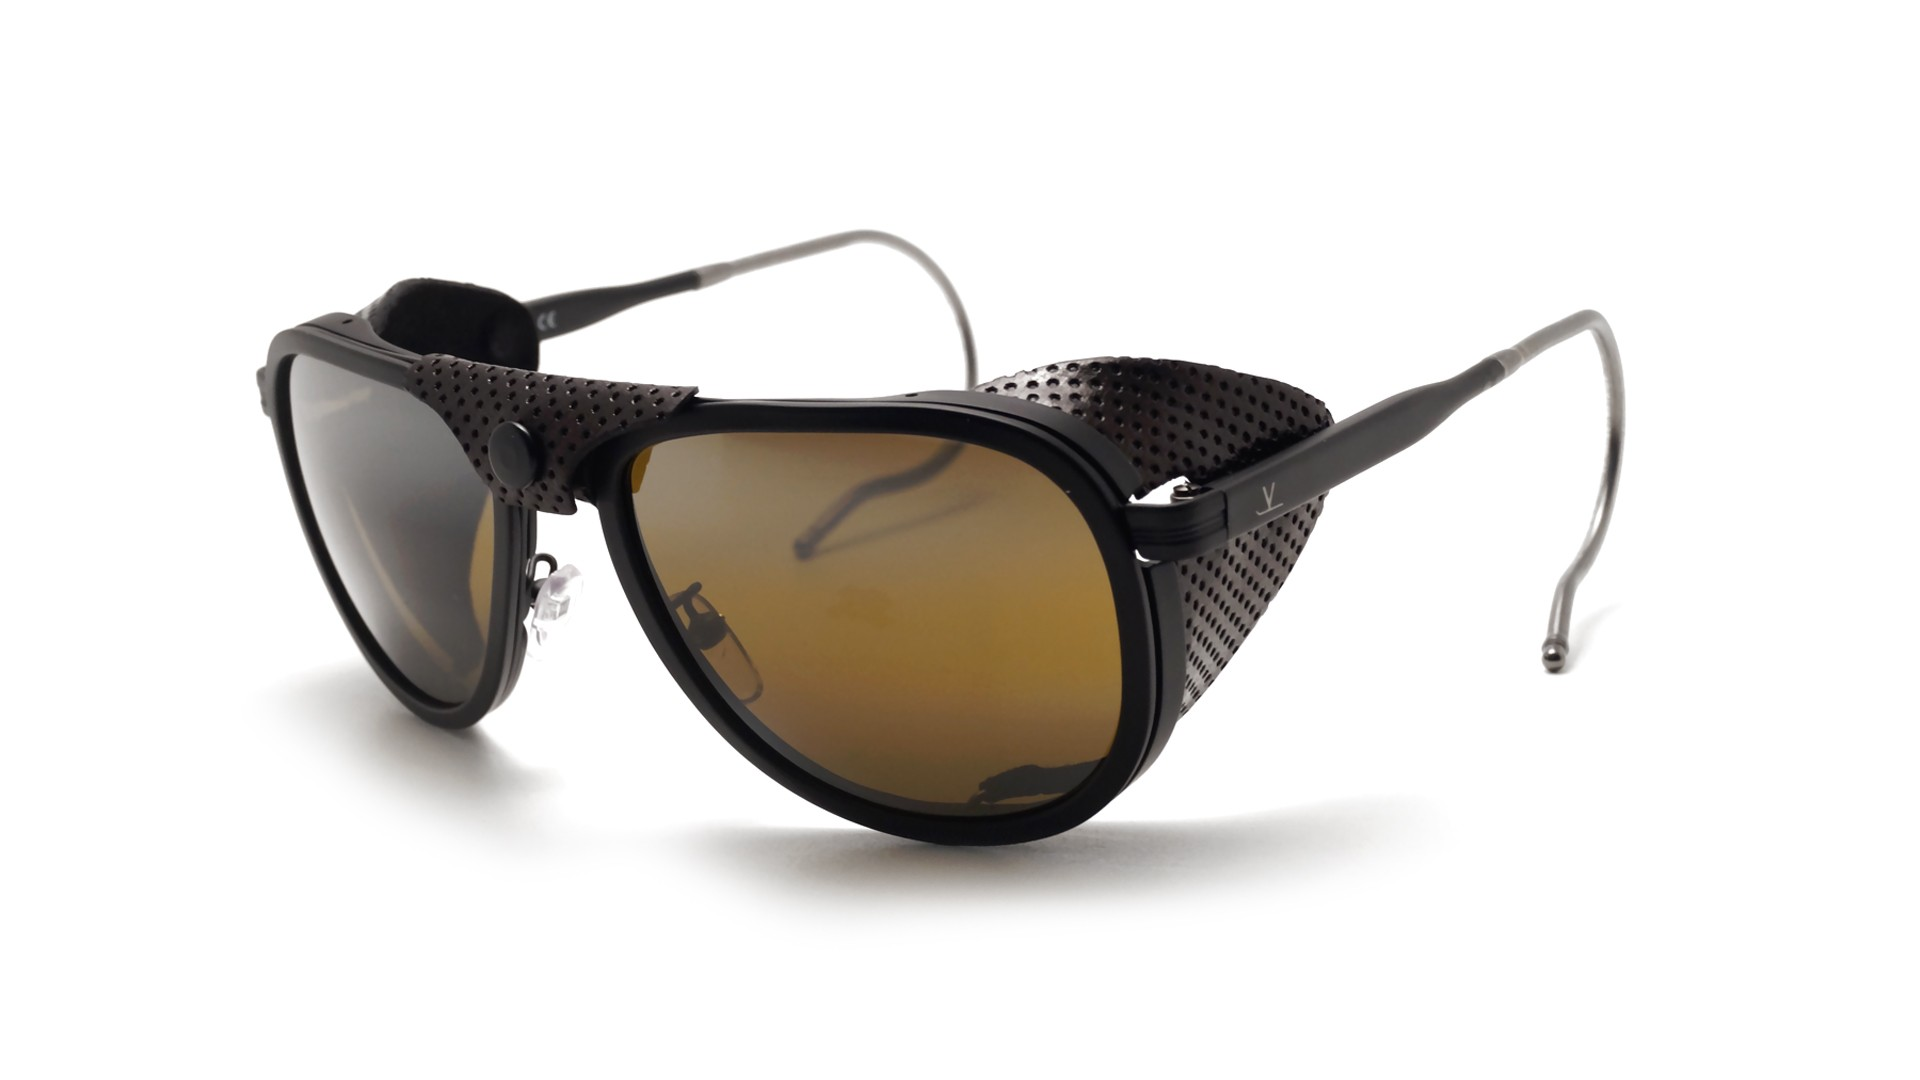 db05fb2476 Sunglasses Vuarnet Glacier 1957 Black Matte VL1315 0010 57-17 Skilynx  Medium Mirror